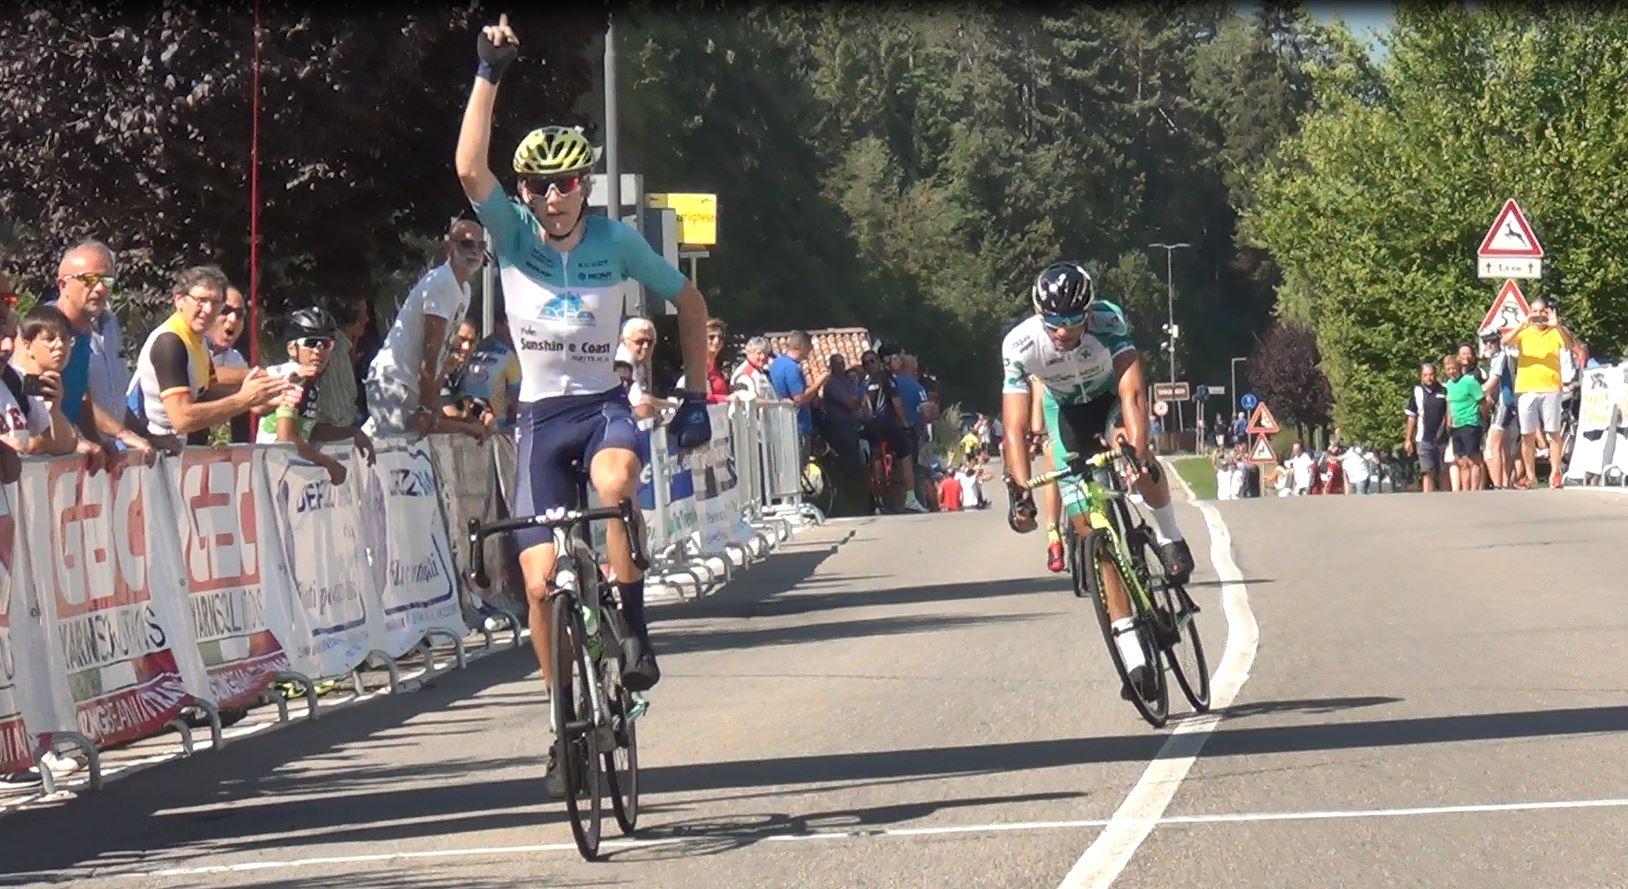 Alastair MacKellar vince la Gazzaniga-Onore 2018